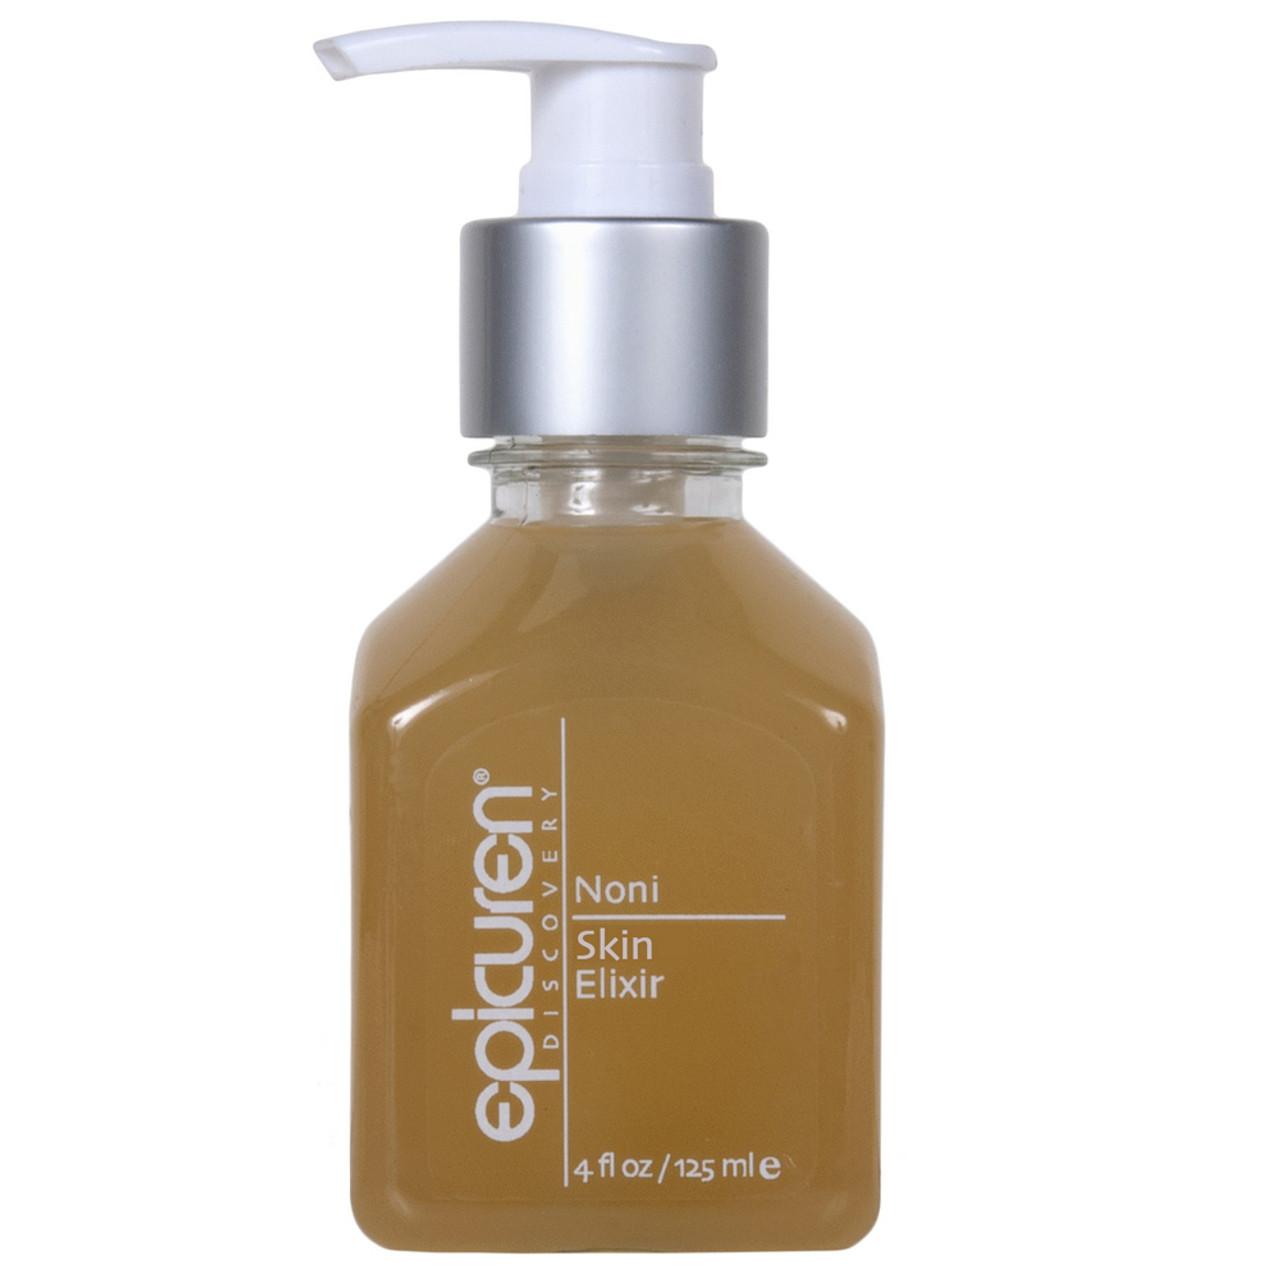 epicuren Discovery Noni Skin Elixir